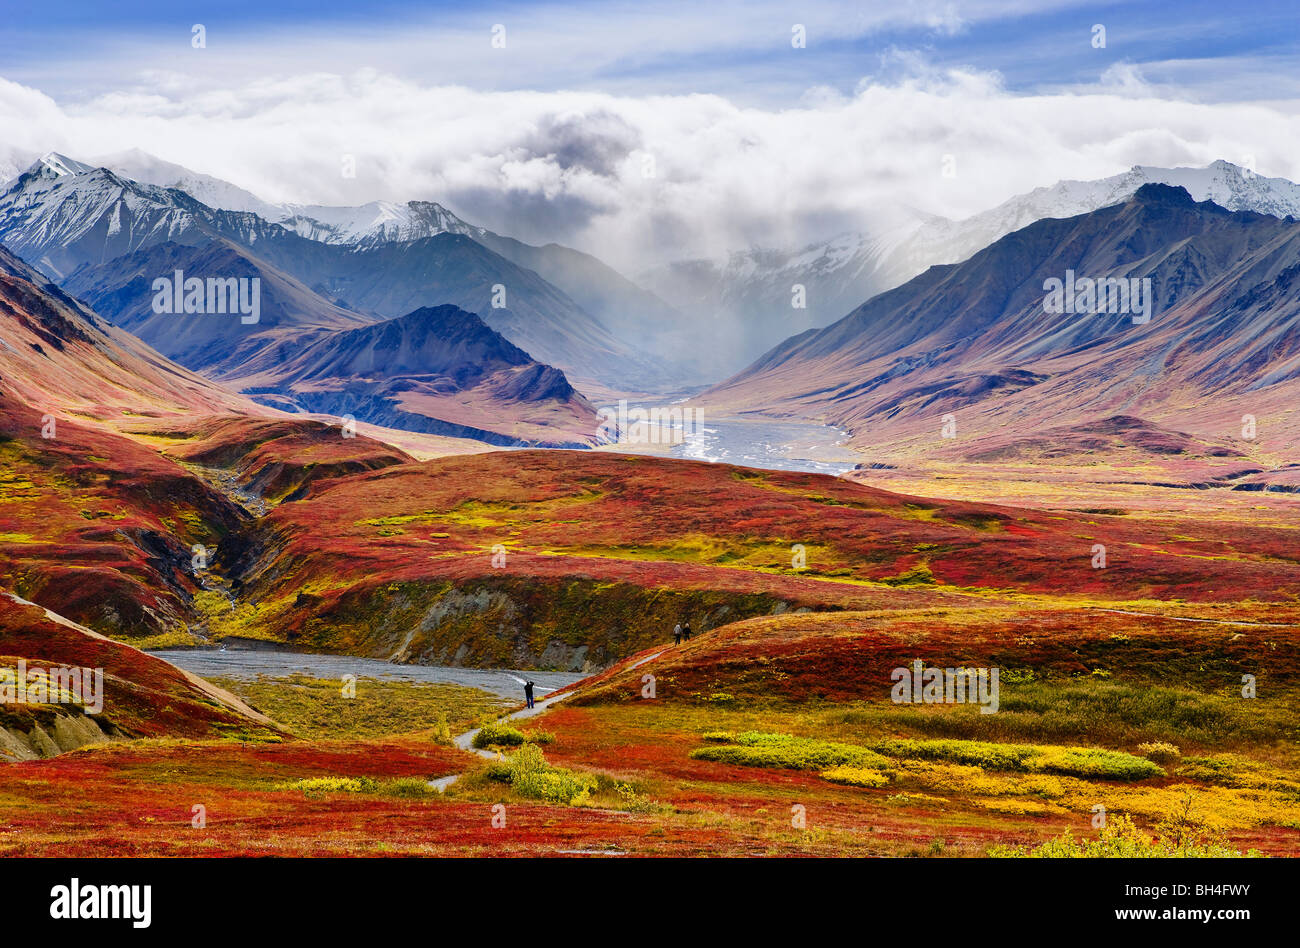 Herbstfarben und Alaska Range, Denali-Nationalpark, Alaska Stockbild